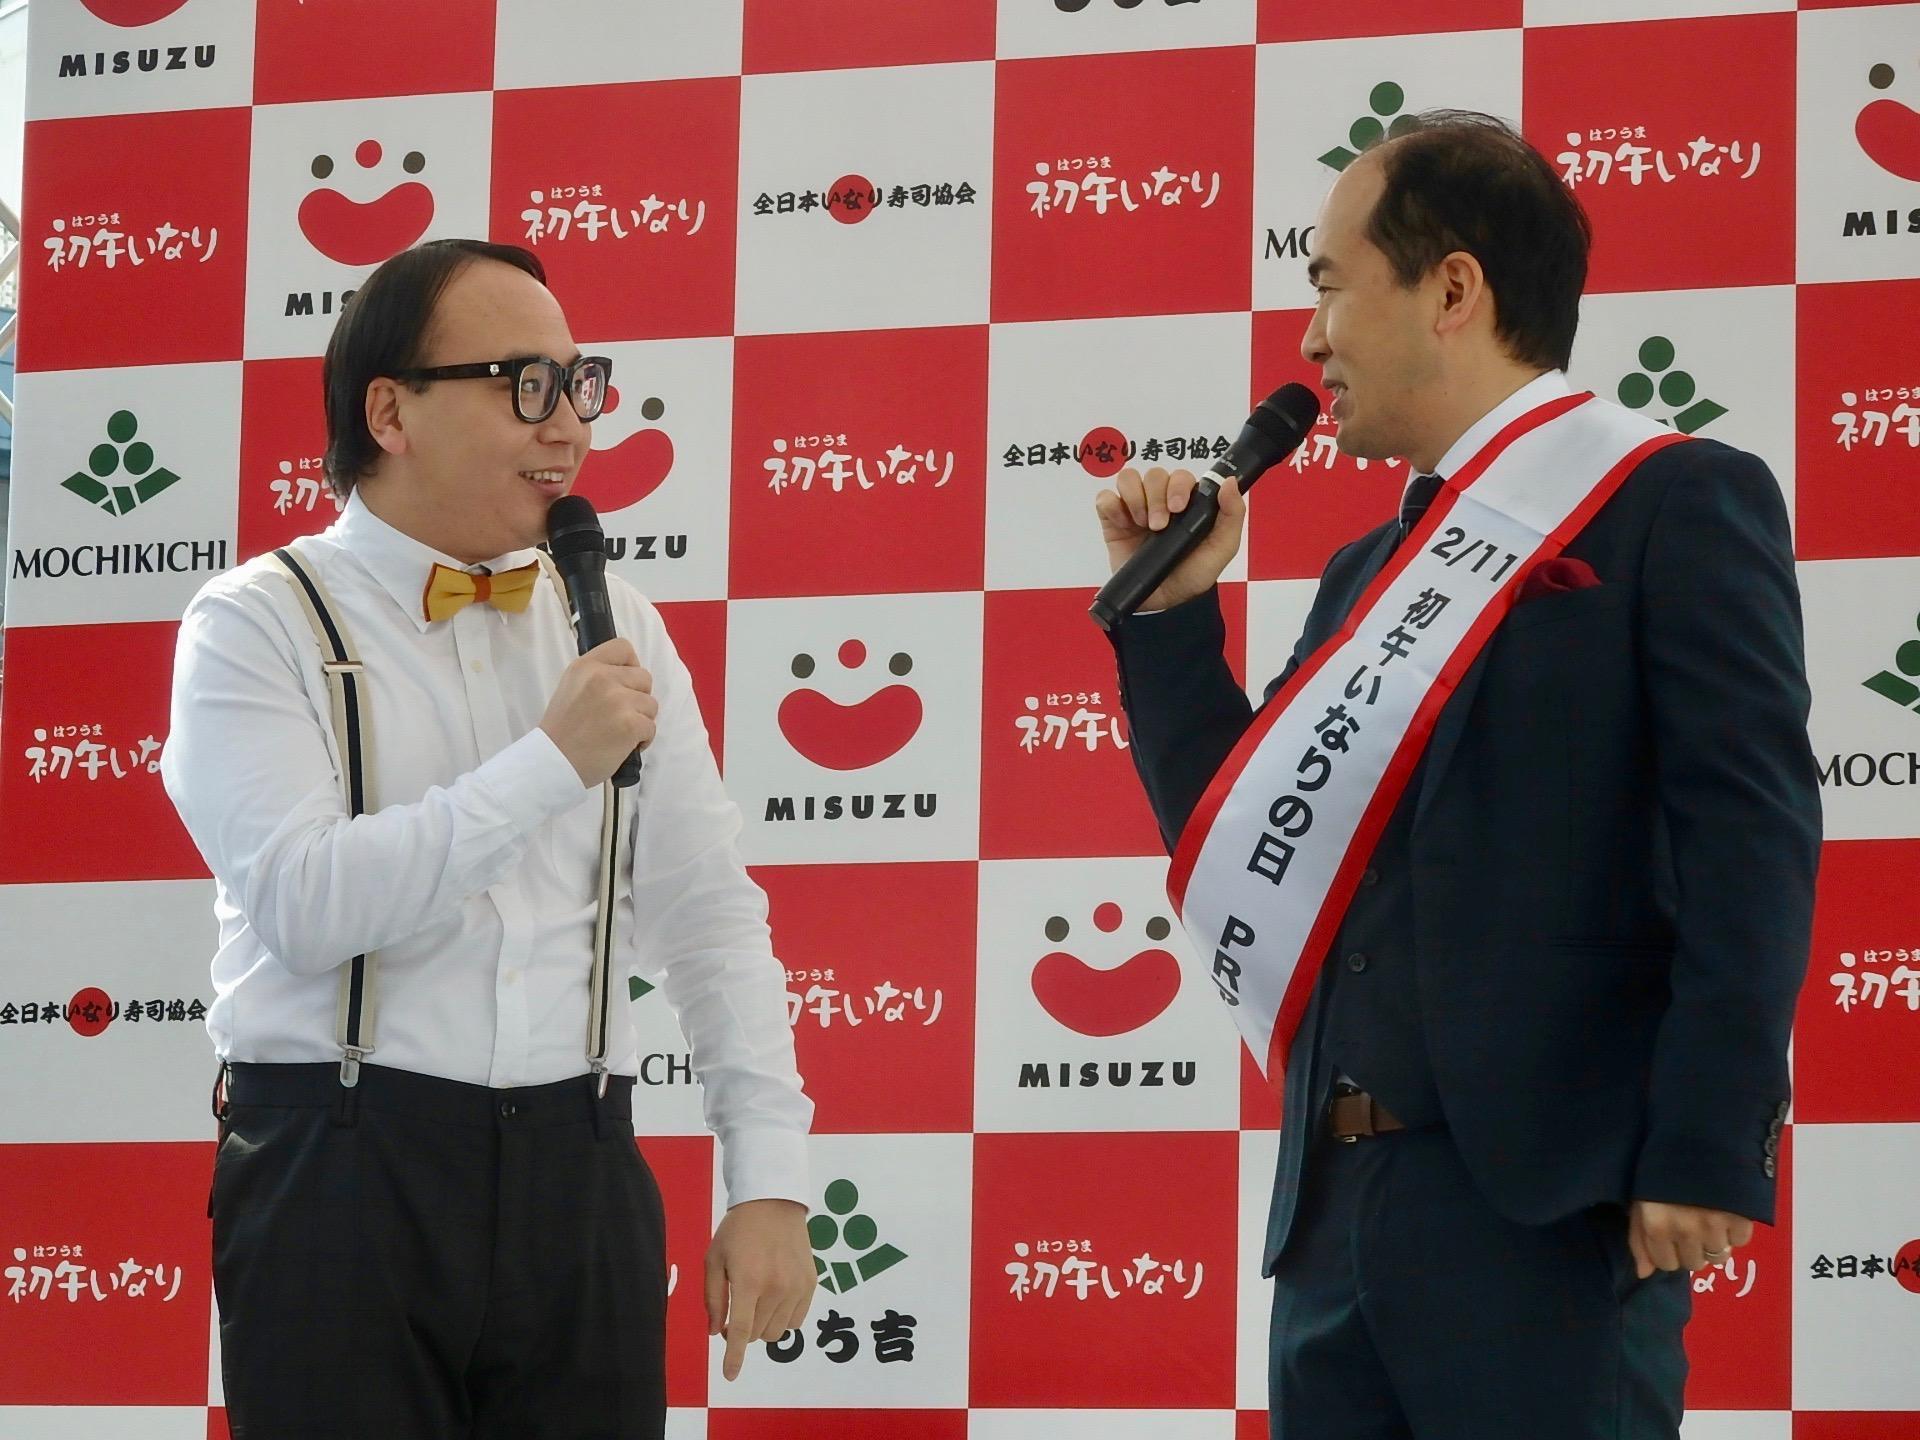 http://news.yoshimoto.co.jp/20180210163709-992ade87d5c76308925f72f95ff02c633c58d838.jpg